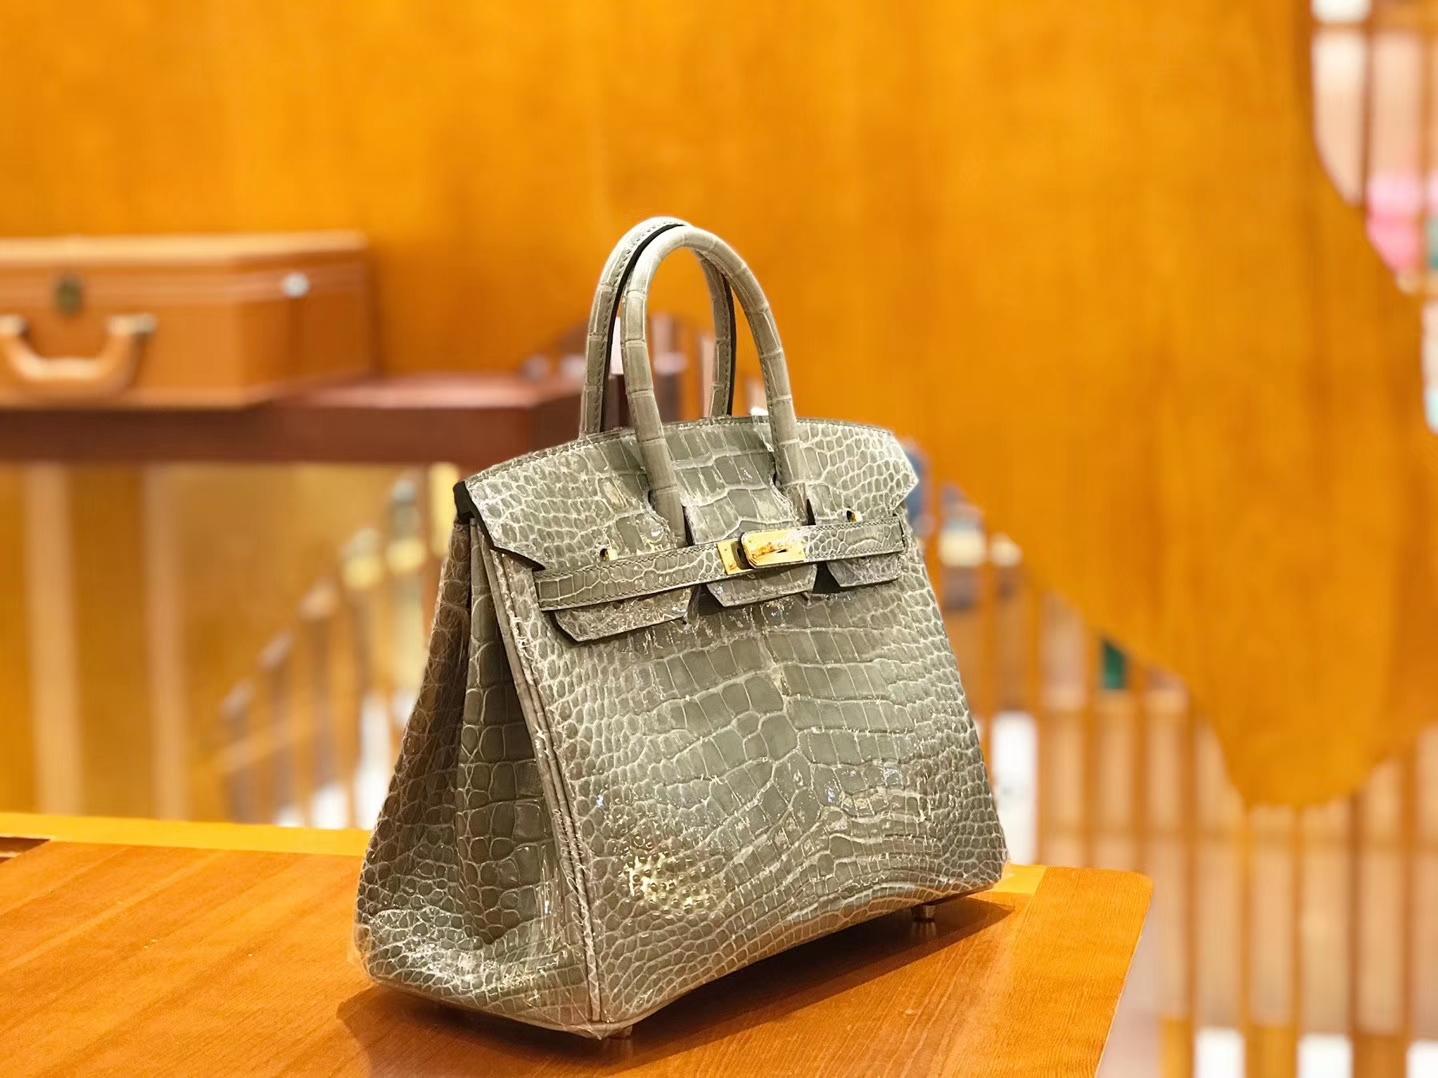 Hermès(爱马仕)Birkin 铂金包 斑鸠灰 美洲 方块印 25cm